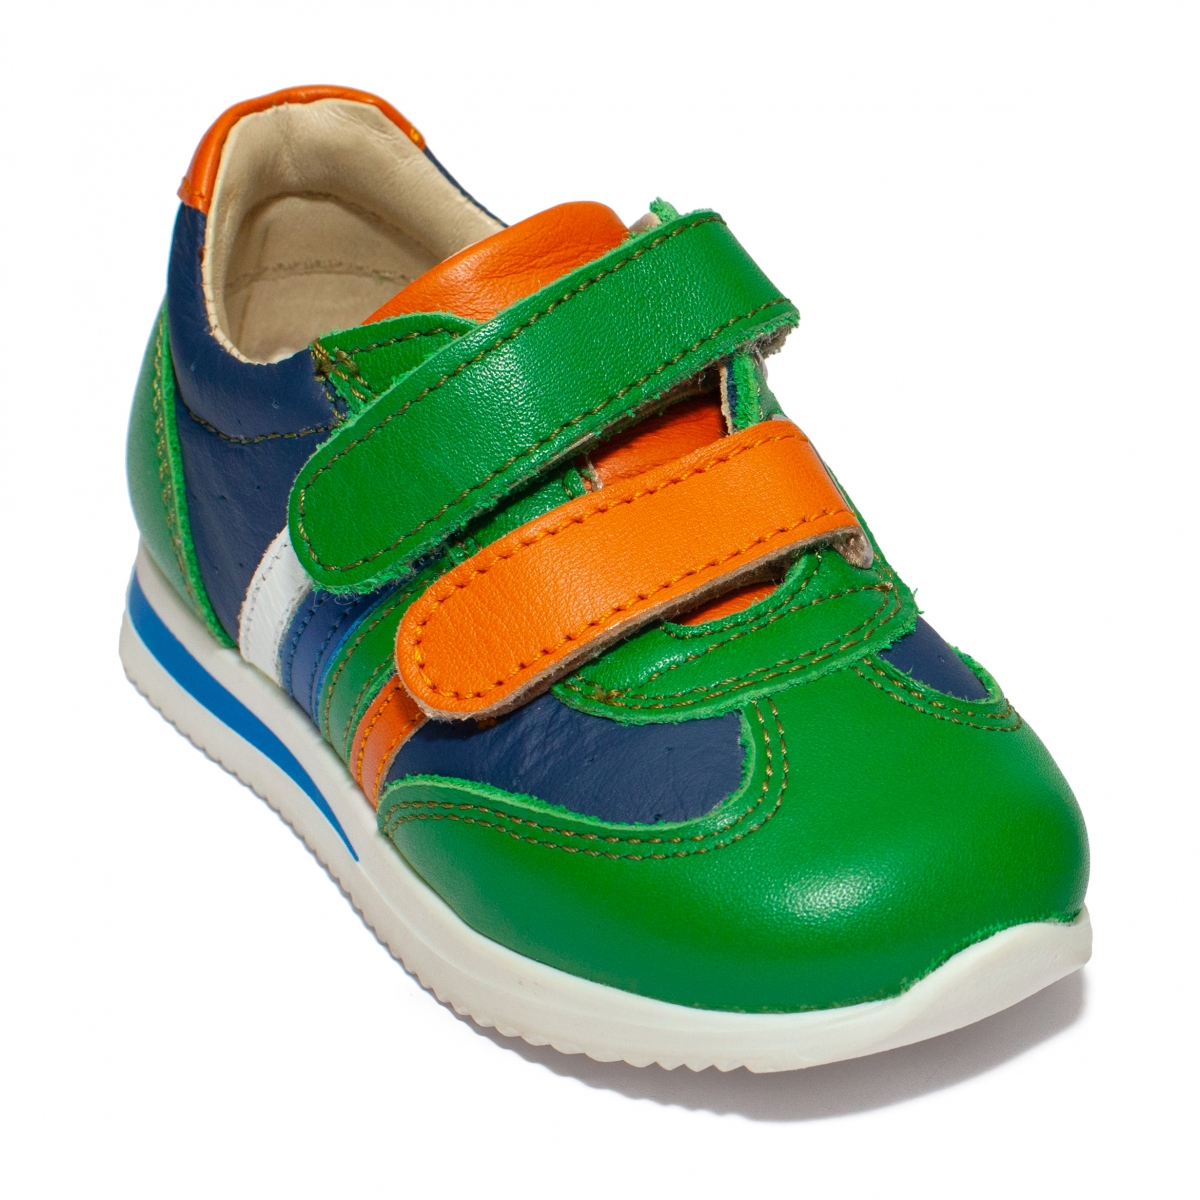 Pantofi sport copii 728 blu verde 19-28